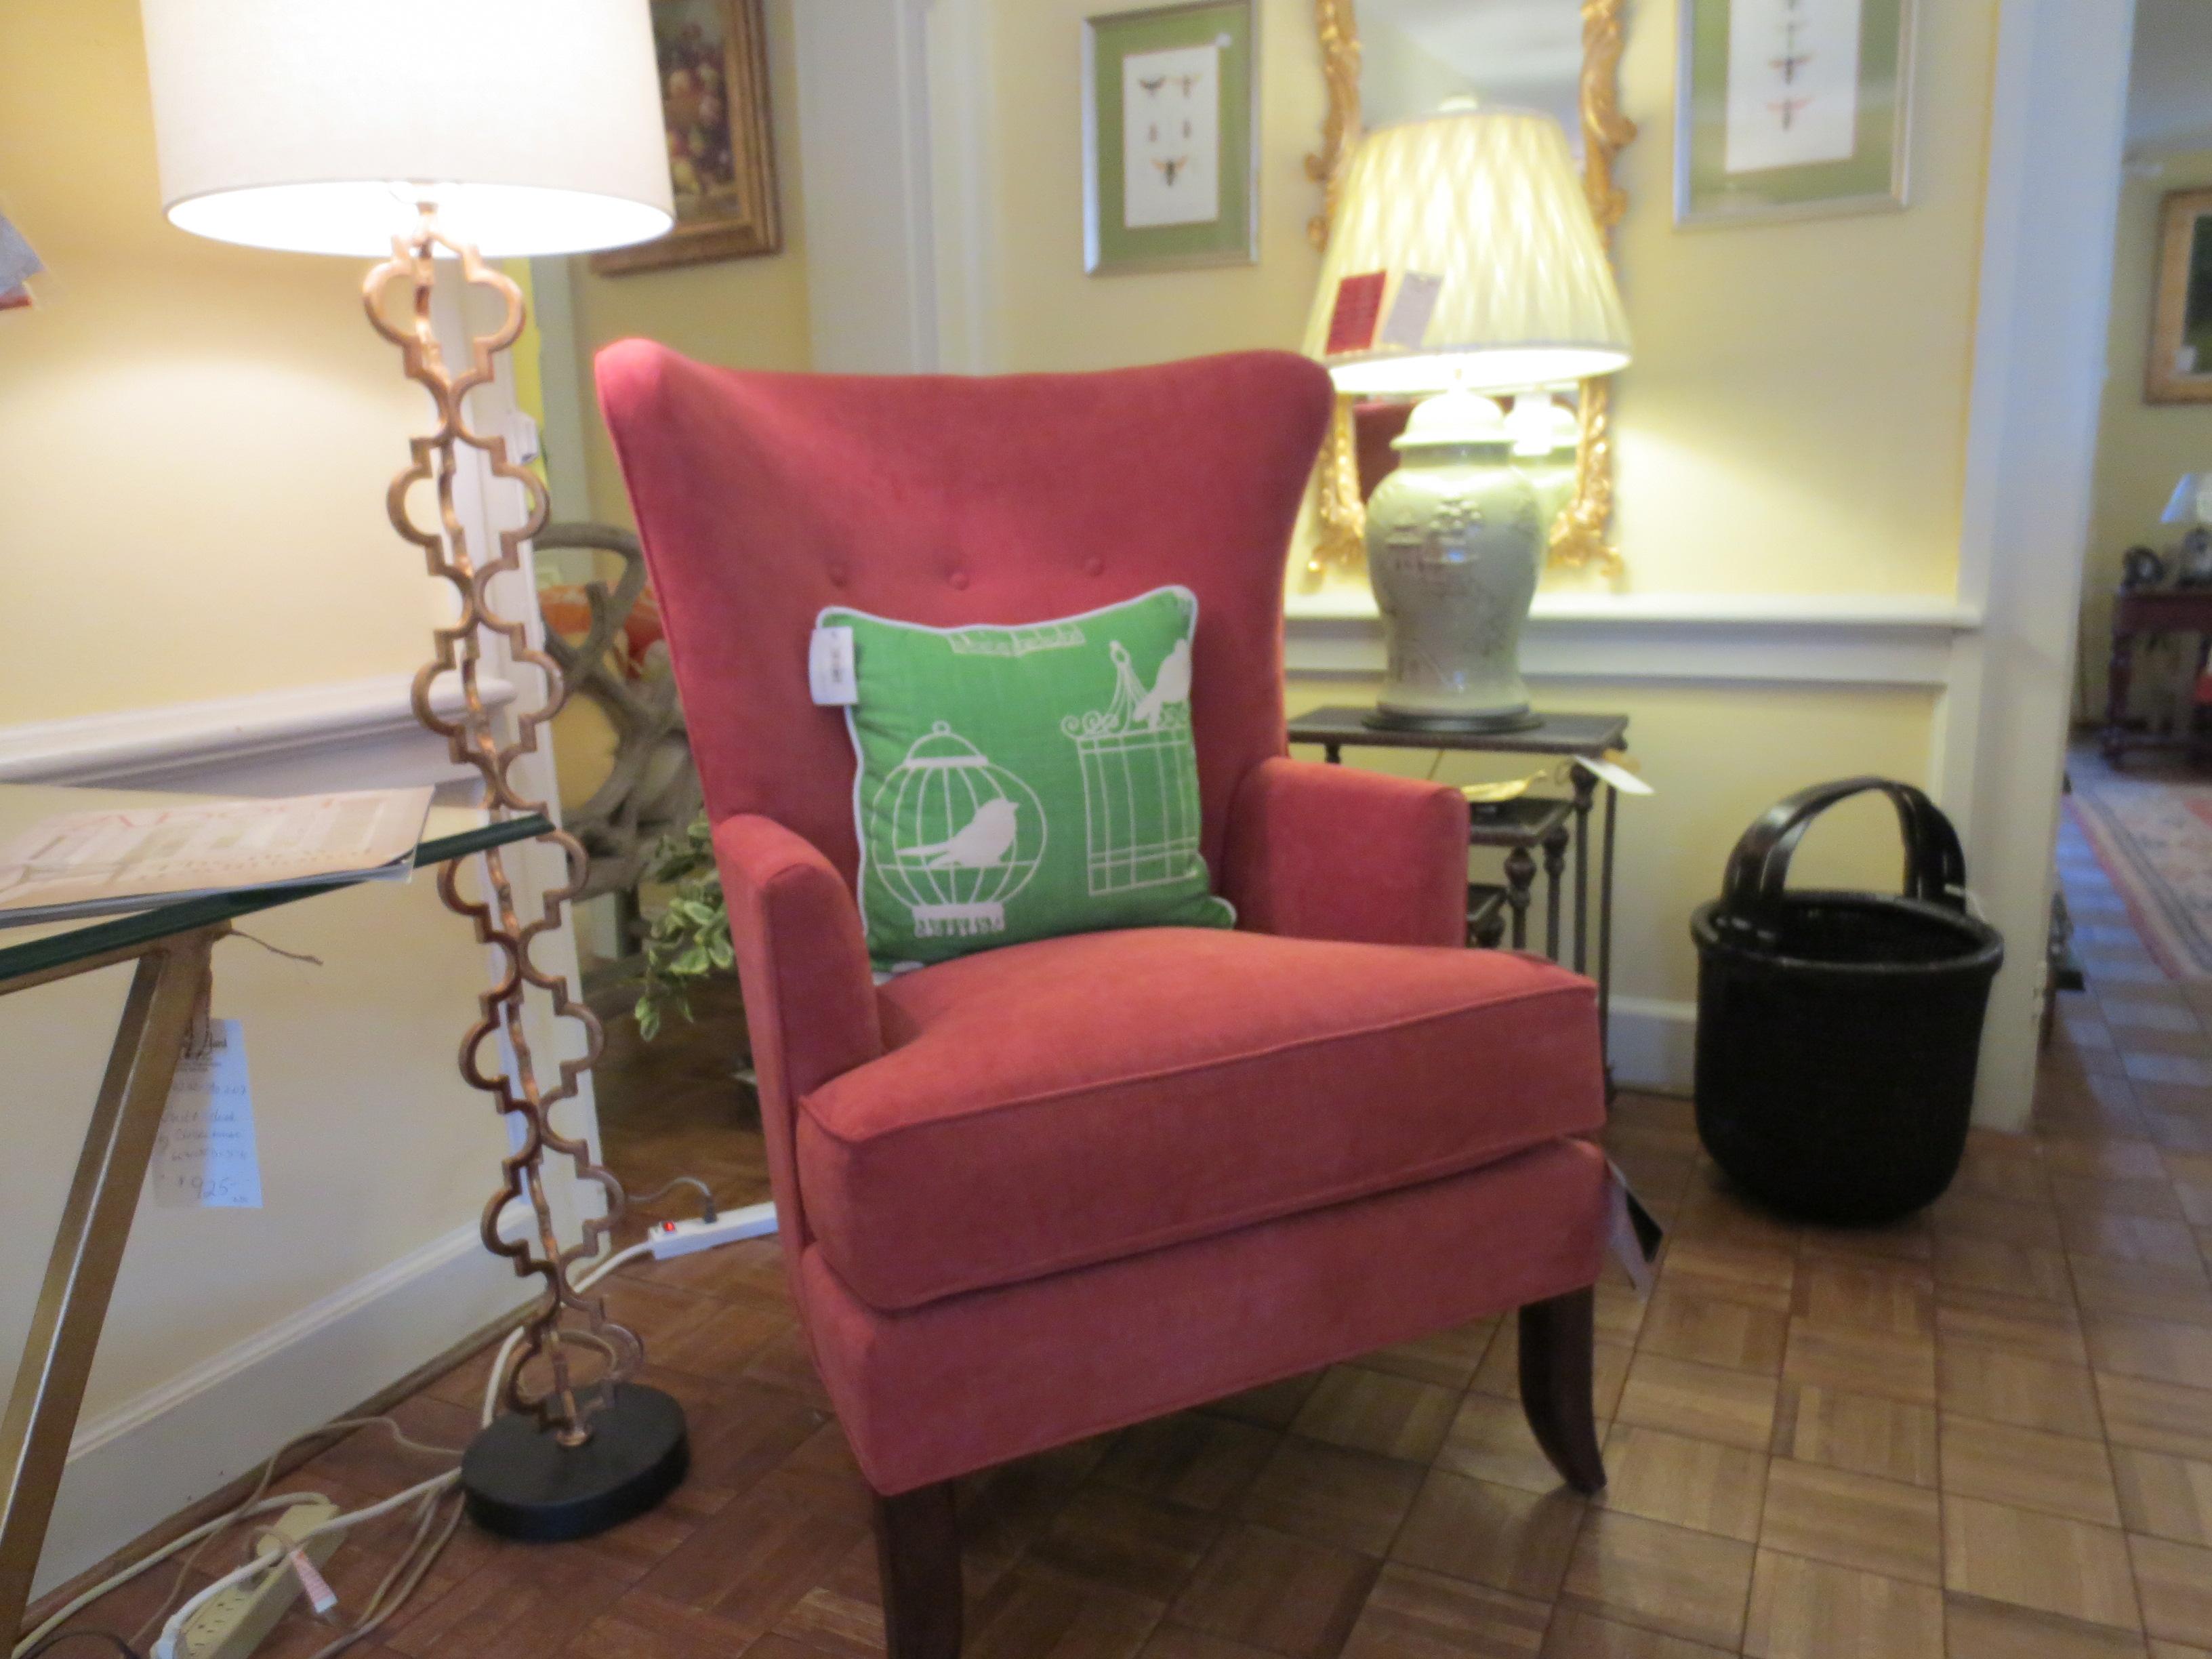 Virginia Beach Charlottesville Roanoke Fabrics Accessories 005 Copy Copy 2 The